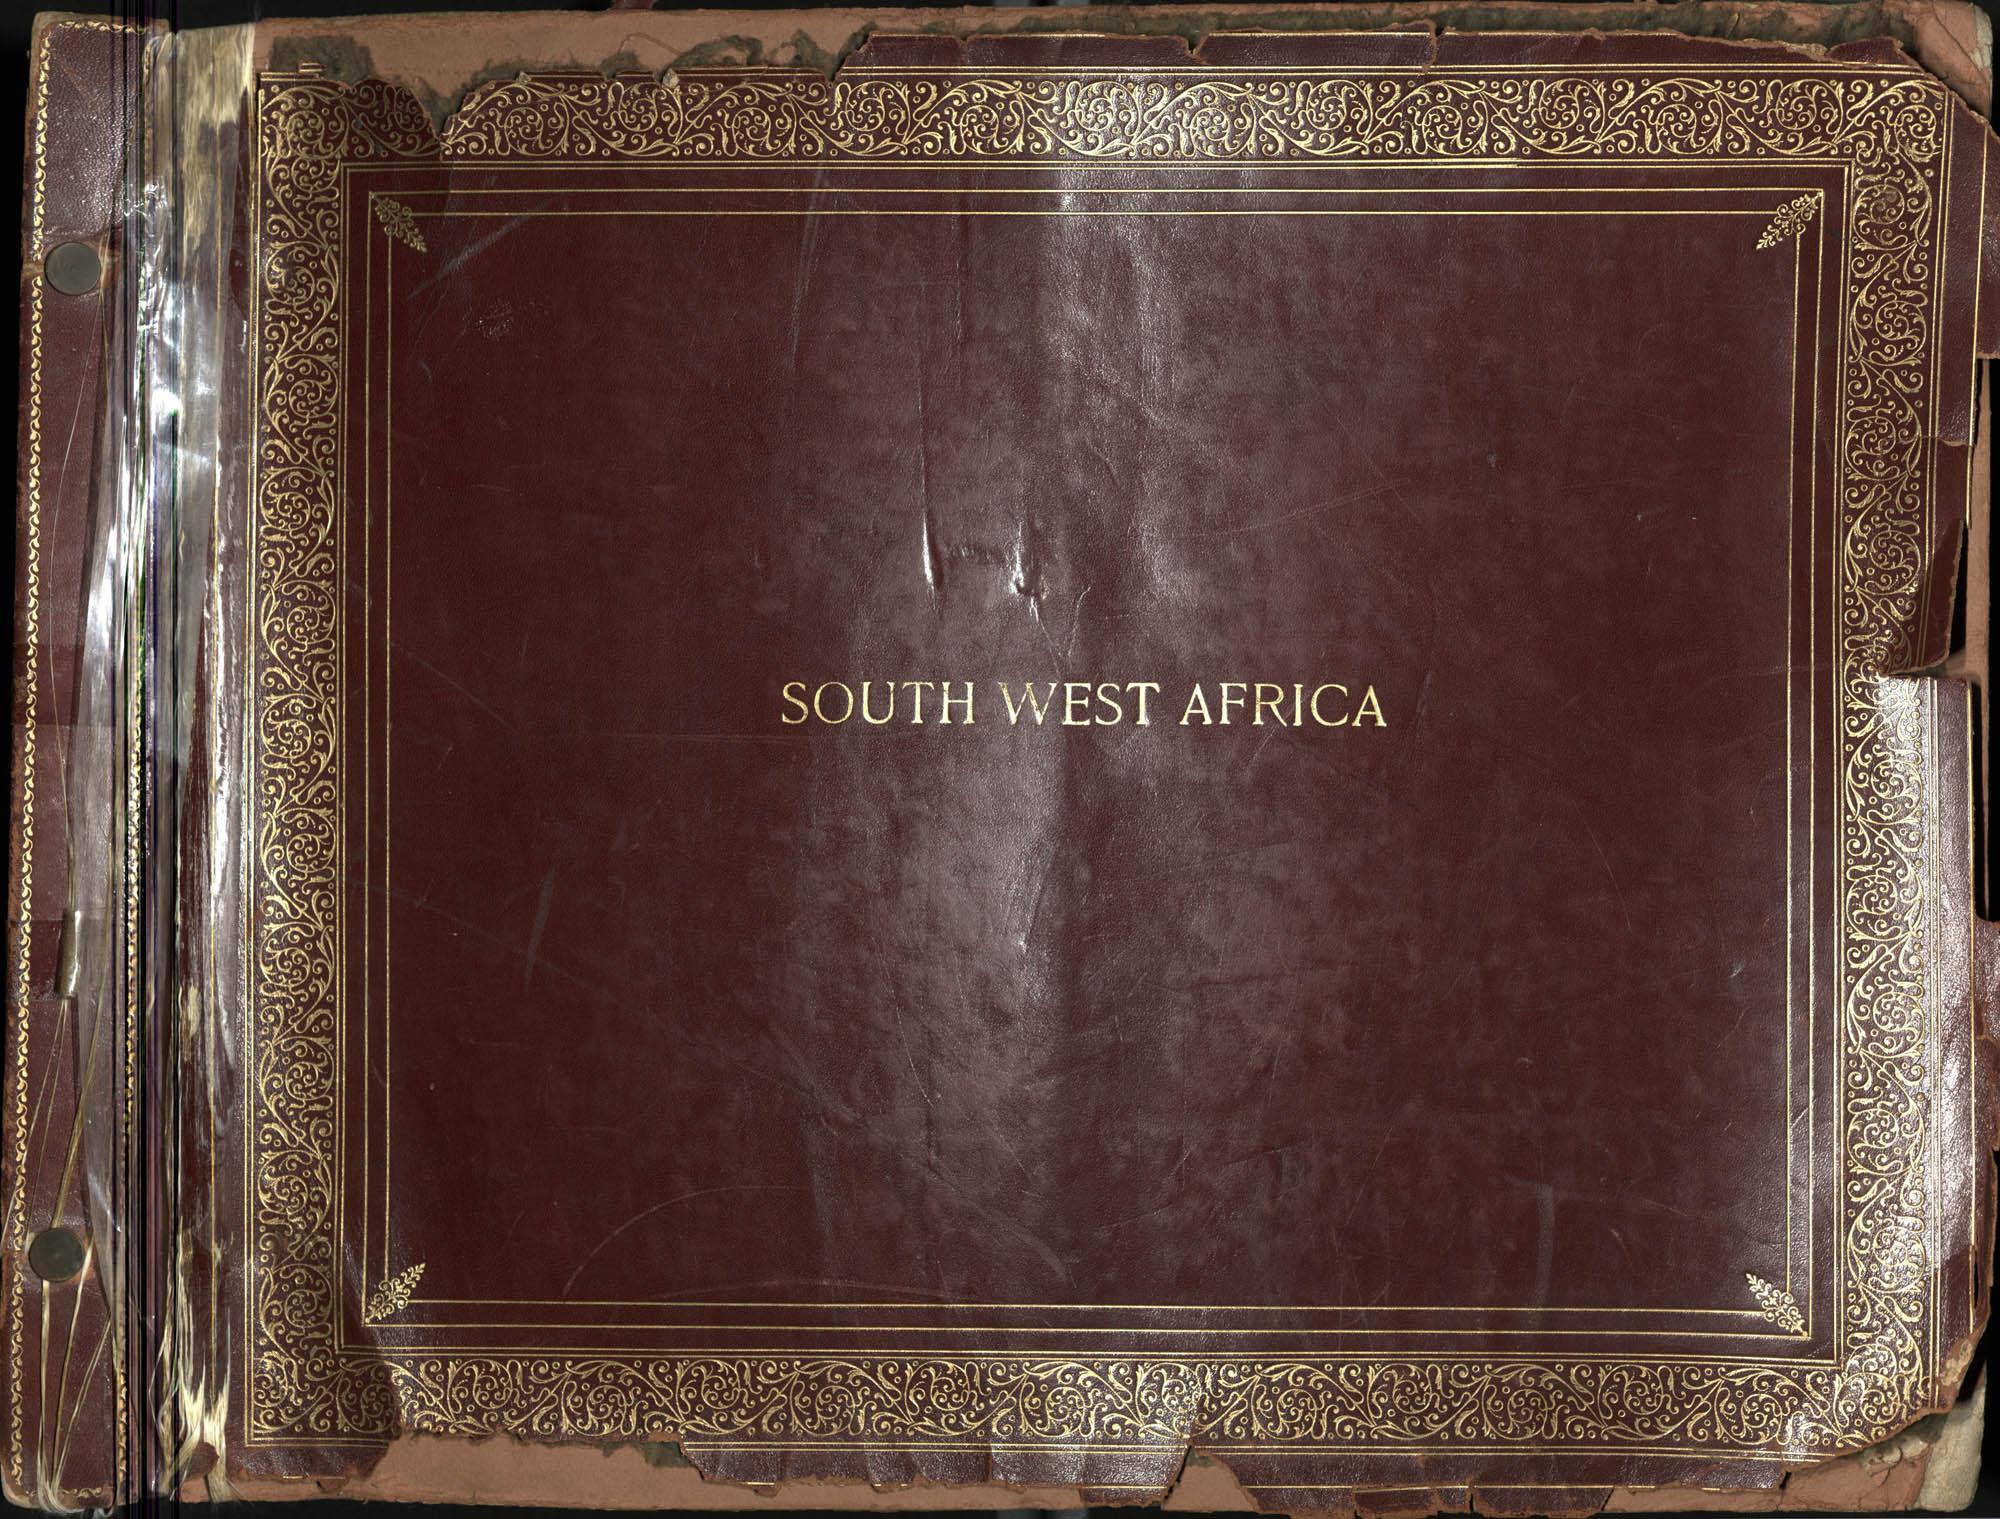 """South West Africa"" Photograph Album, 1937"